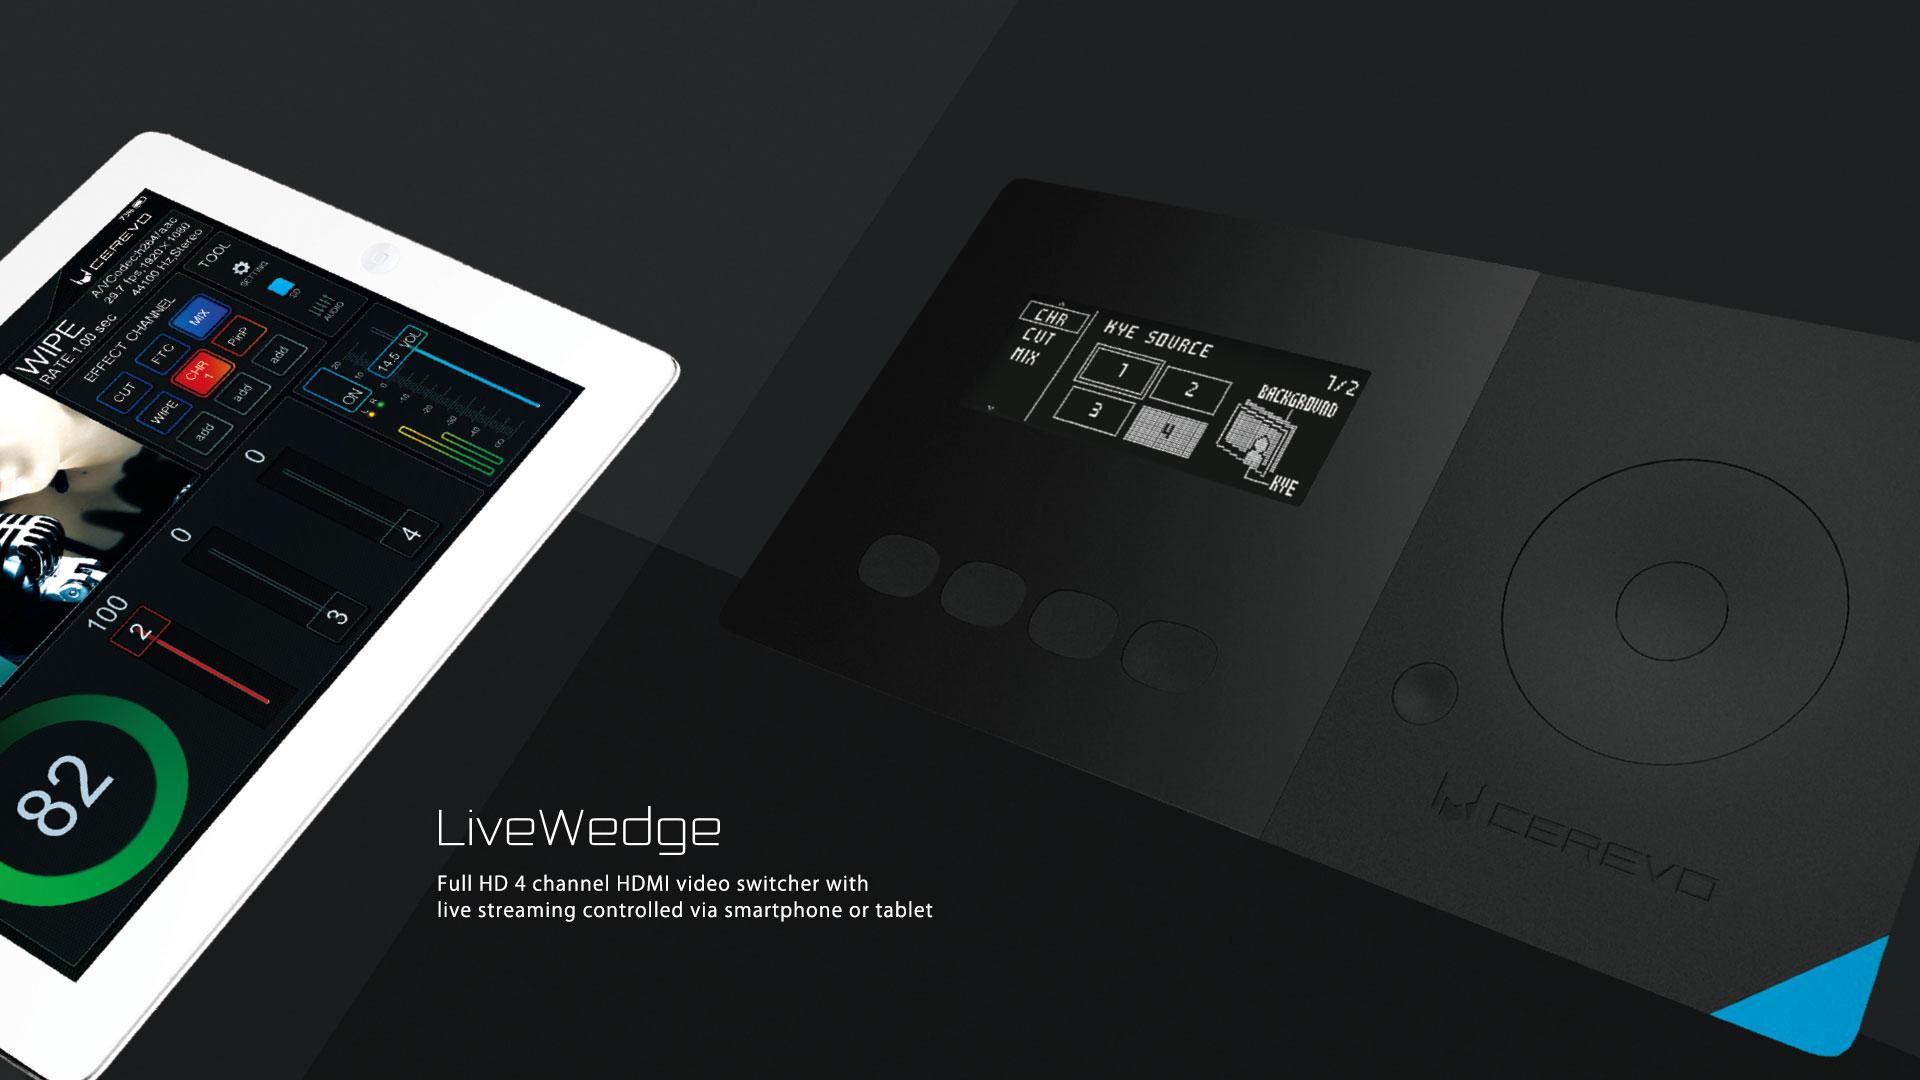 LiveWedge